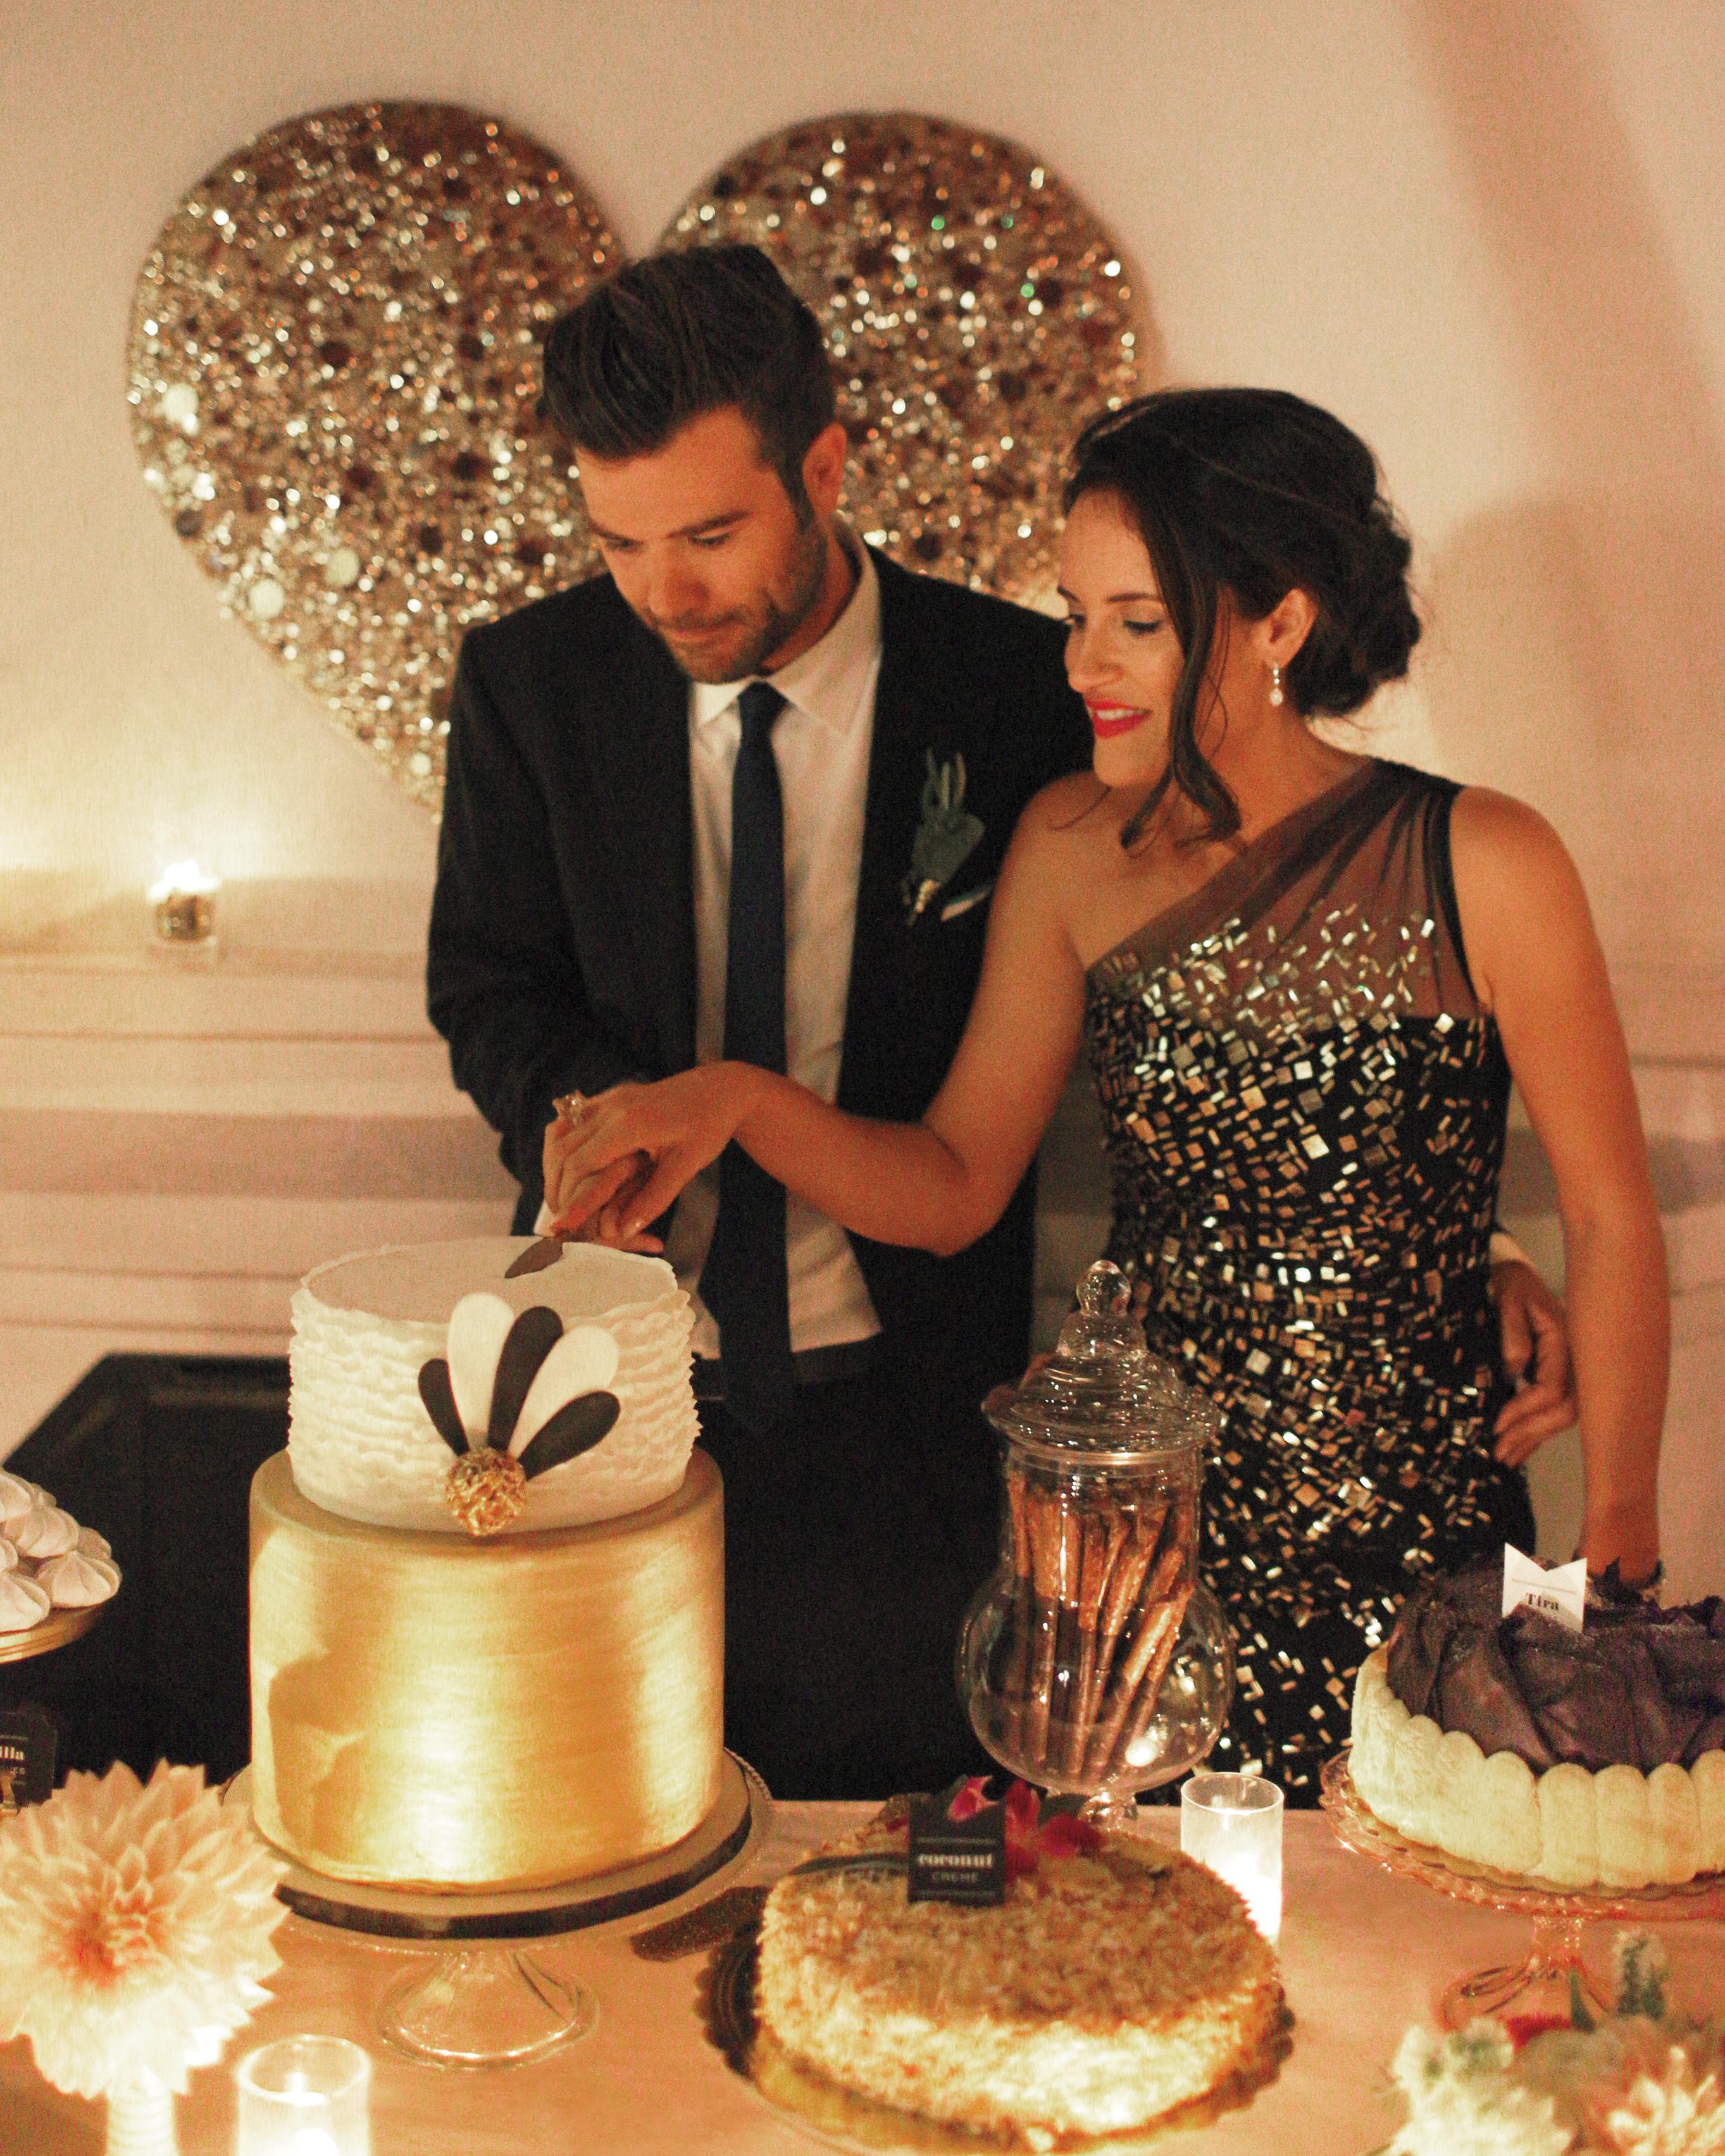 cake-cutting-002-mwd109359.jpg